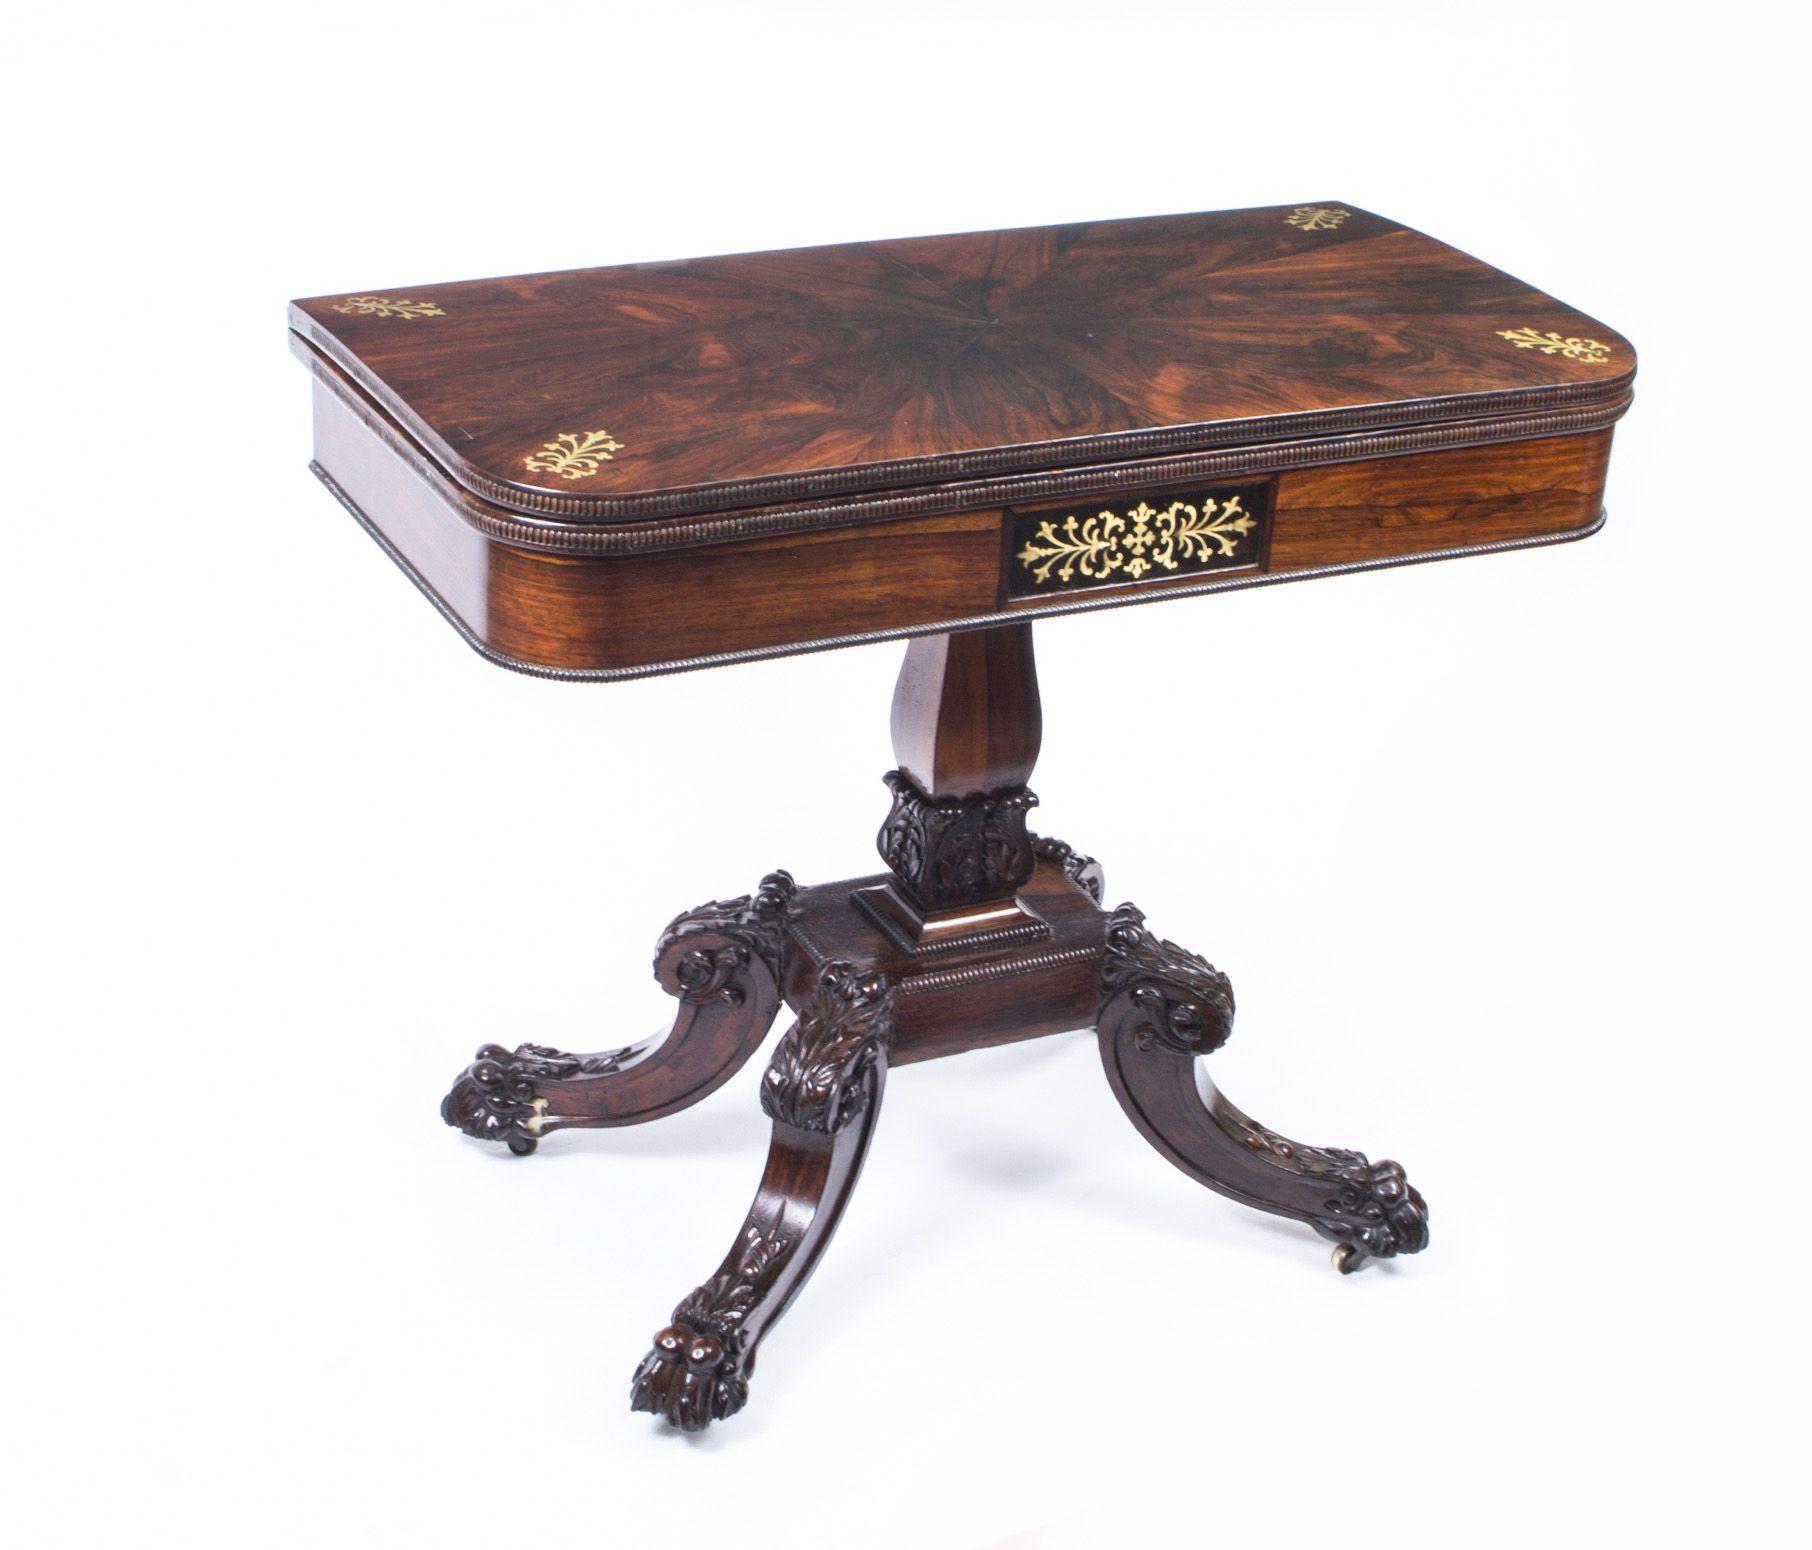 Antique regency mahogany tea table antique card tables uk antique - Antique Regency Rosewood Brass Inlaid Card Table C 1825